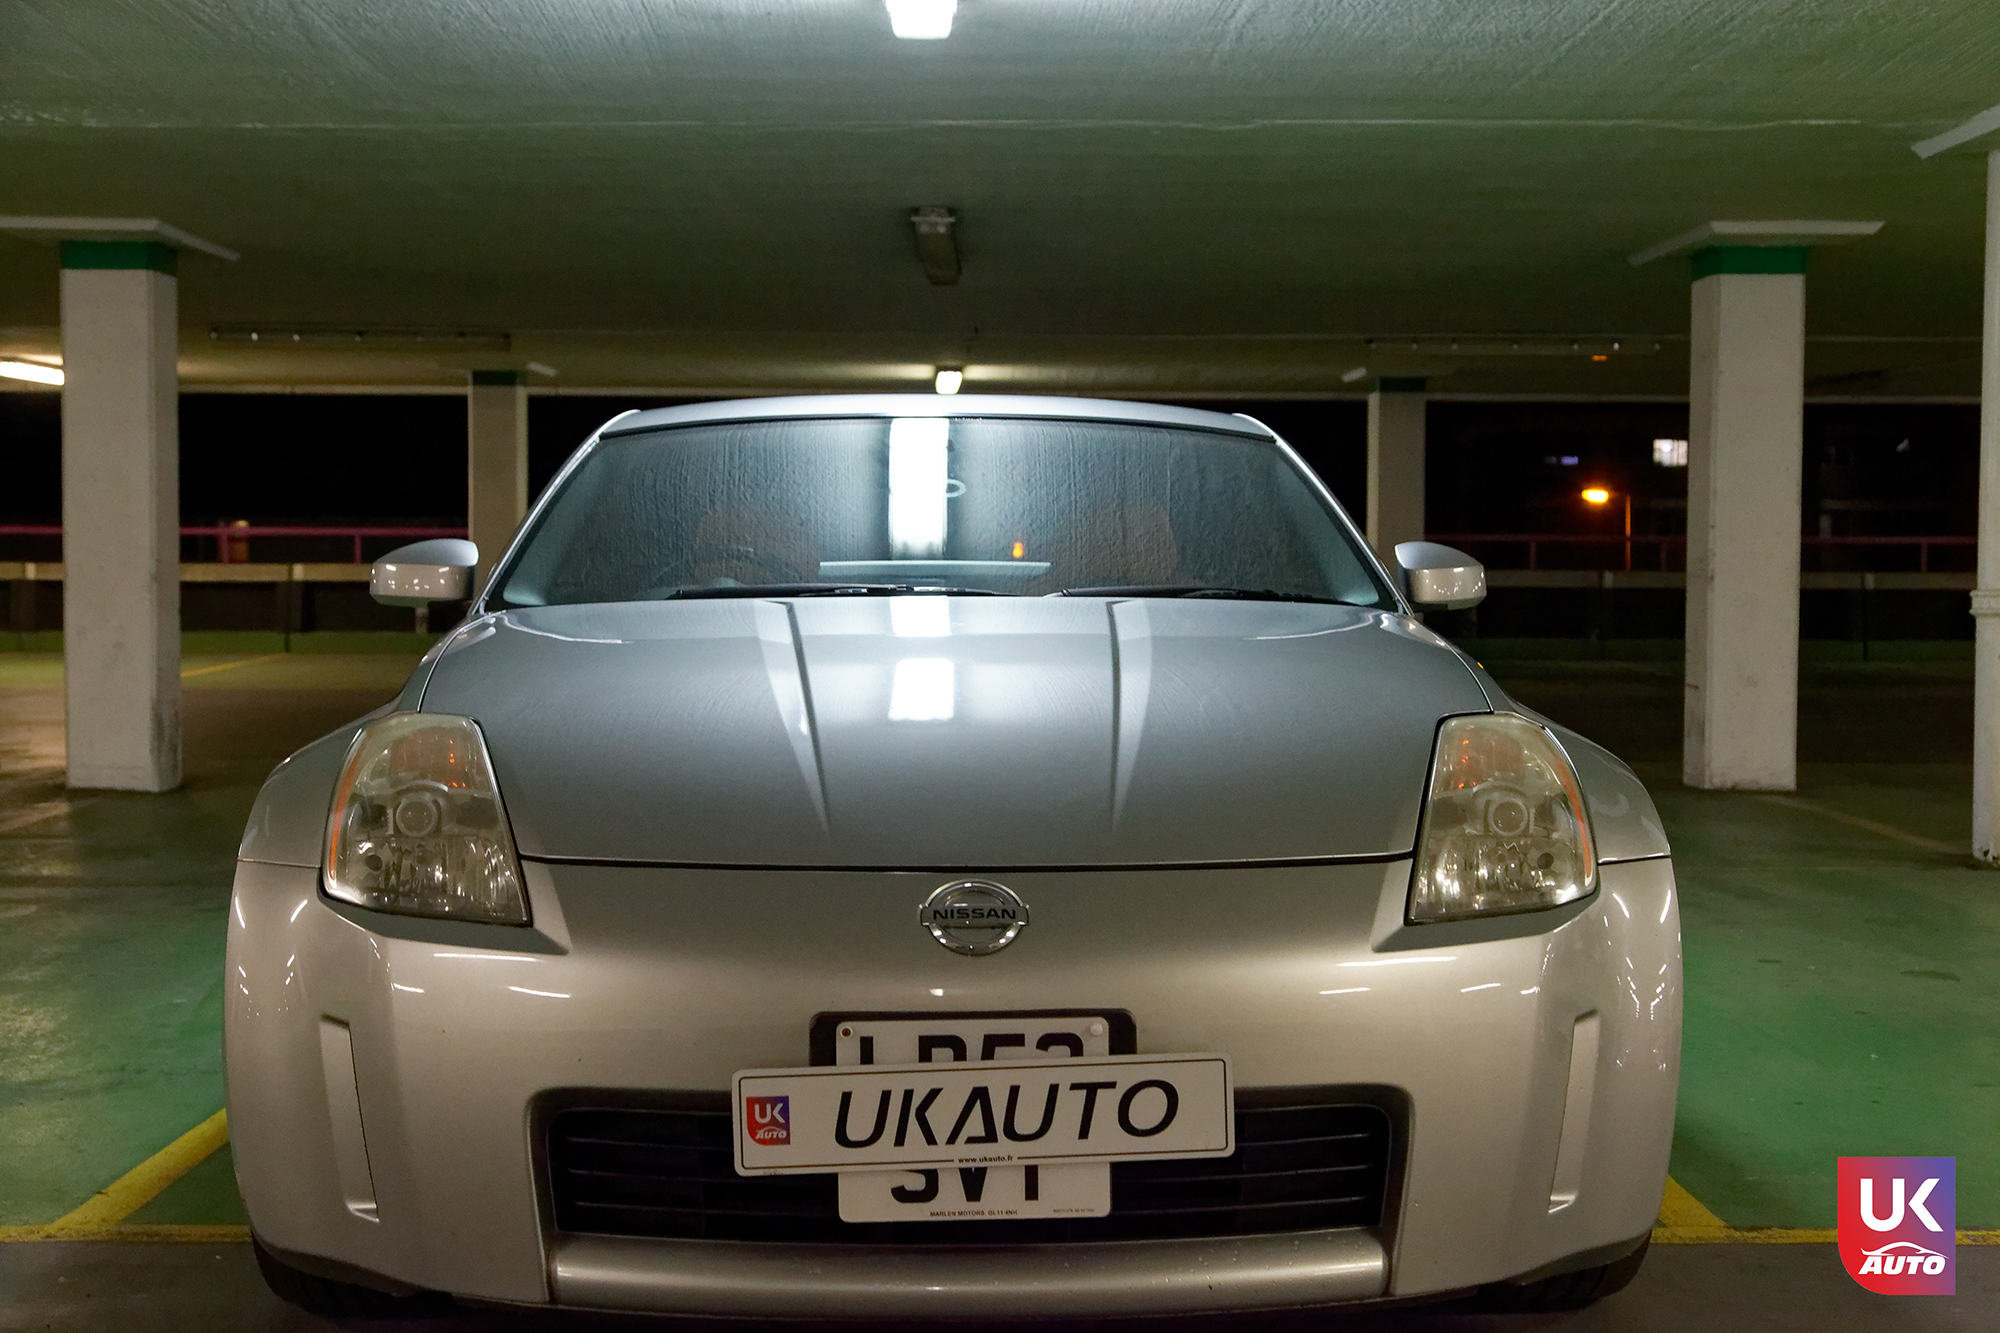 Ukauto import nissan 350z jdm import fairlady v6 import uk ukauto rhd nissan import uk2 - Import Nissan 350Z JDM IMPORT 3.5 V6 TIPTRONIC IMPORT AUTO par UKAUTO